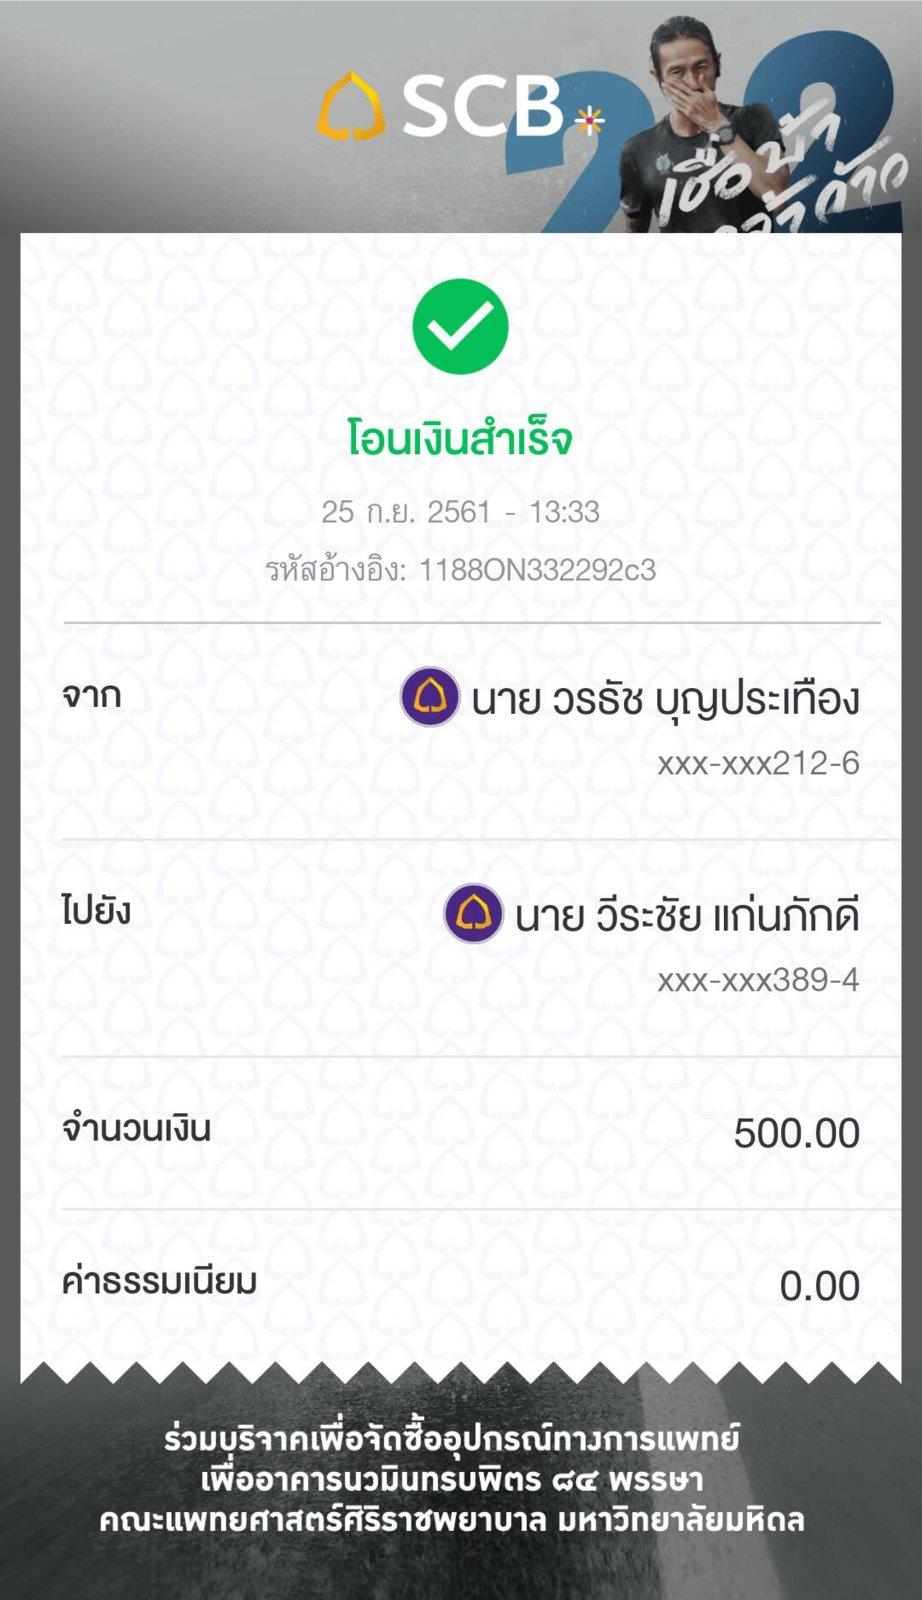 TXN_1188ON332292c3_1537857202986.jpg